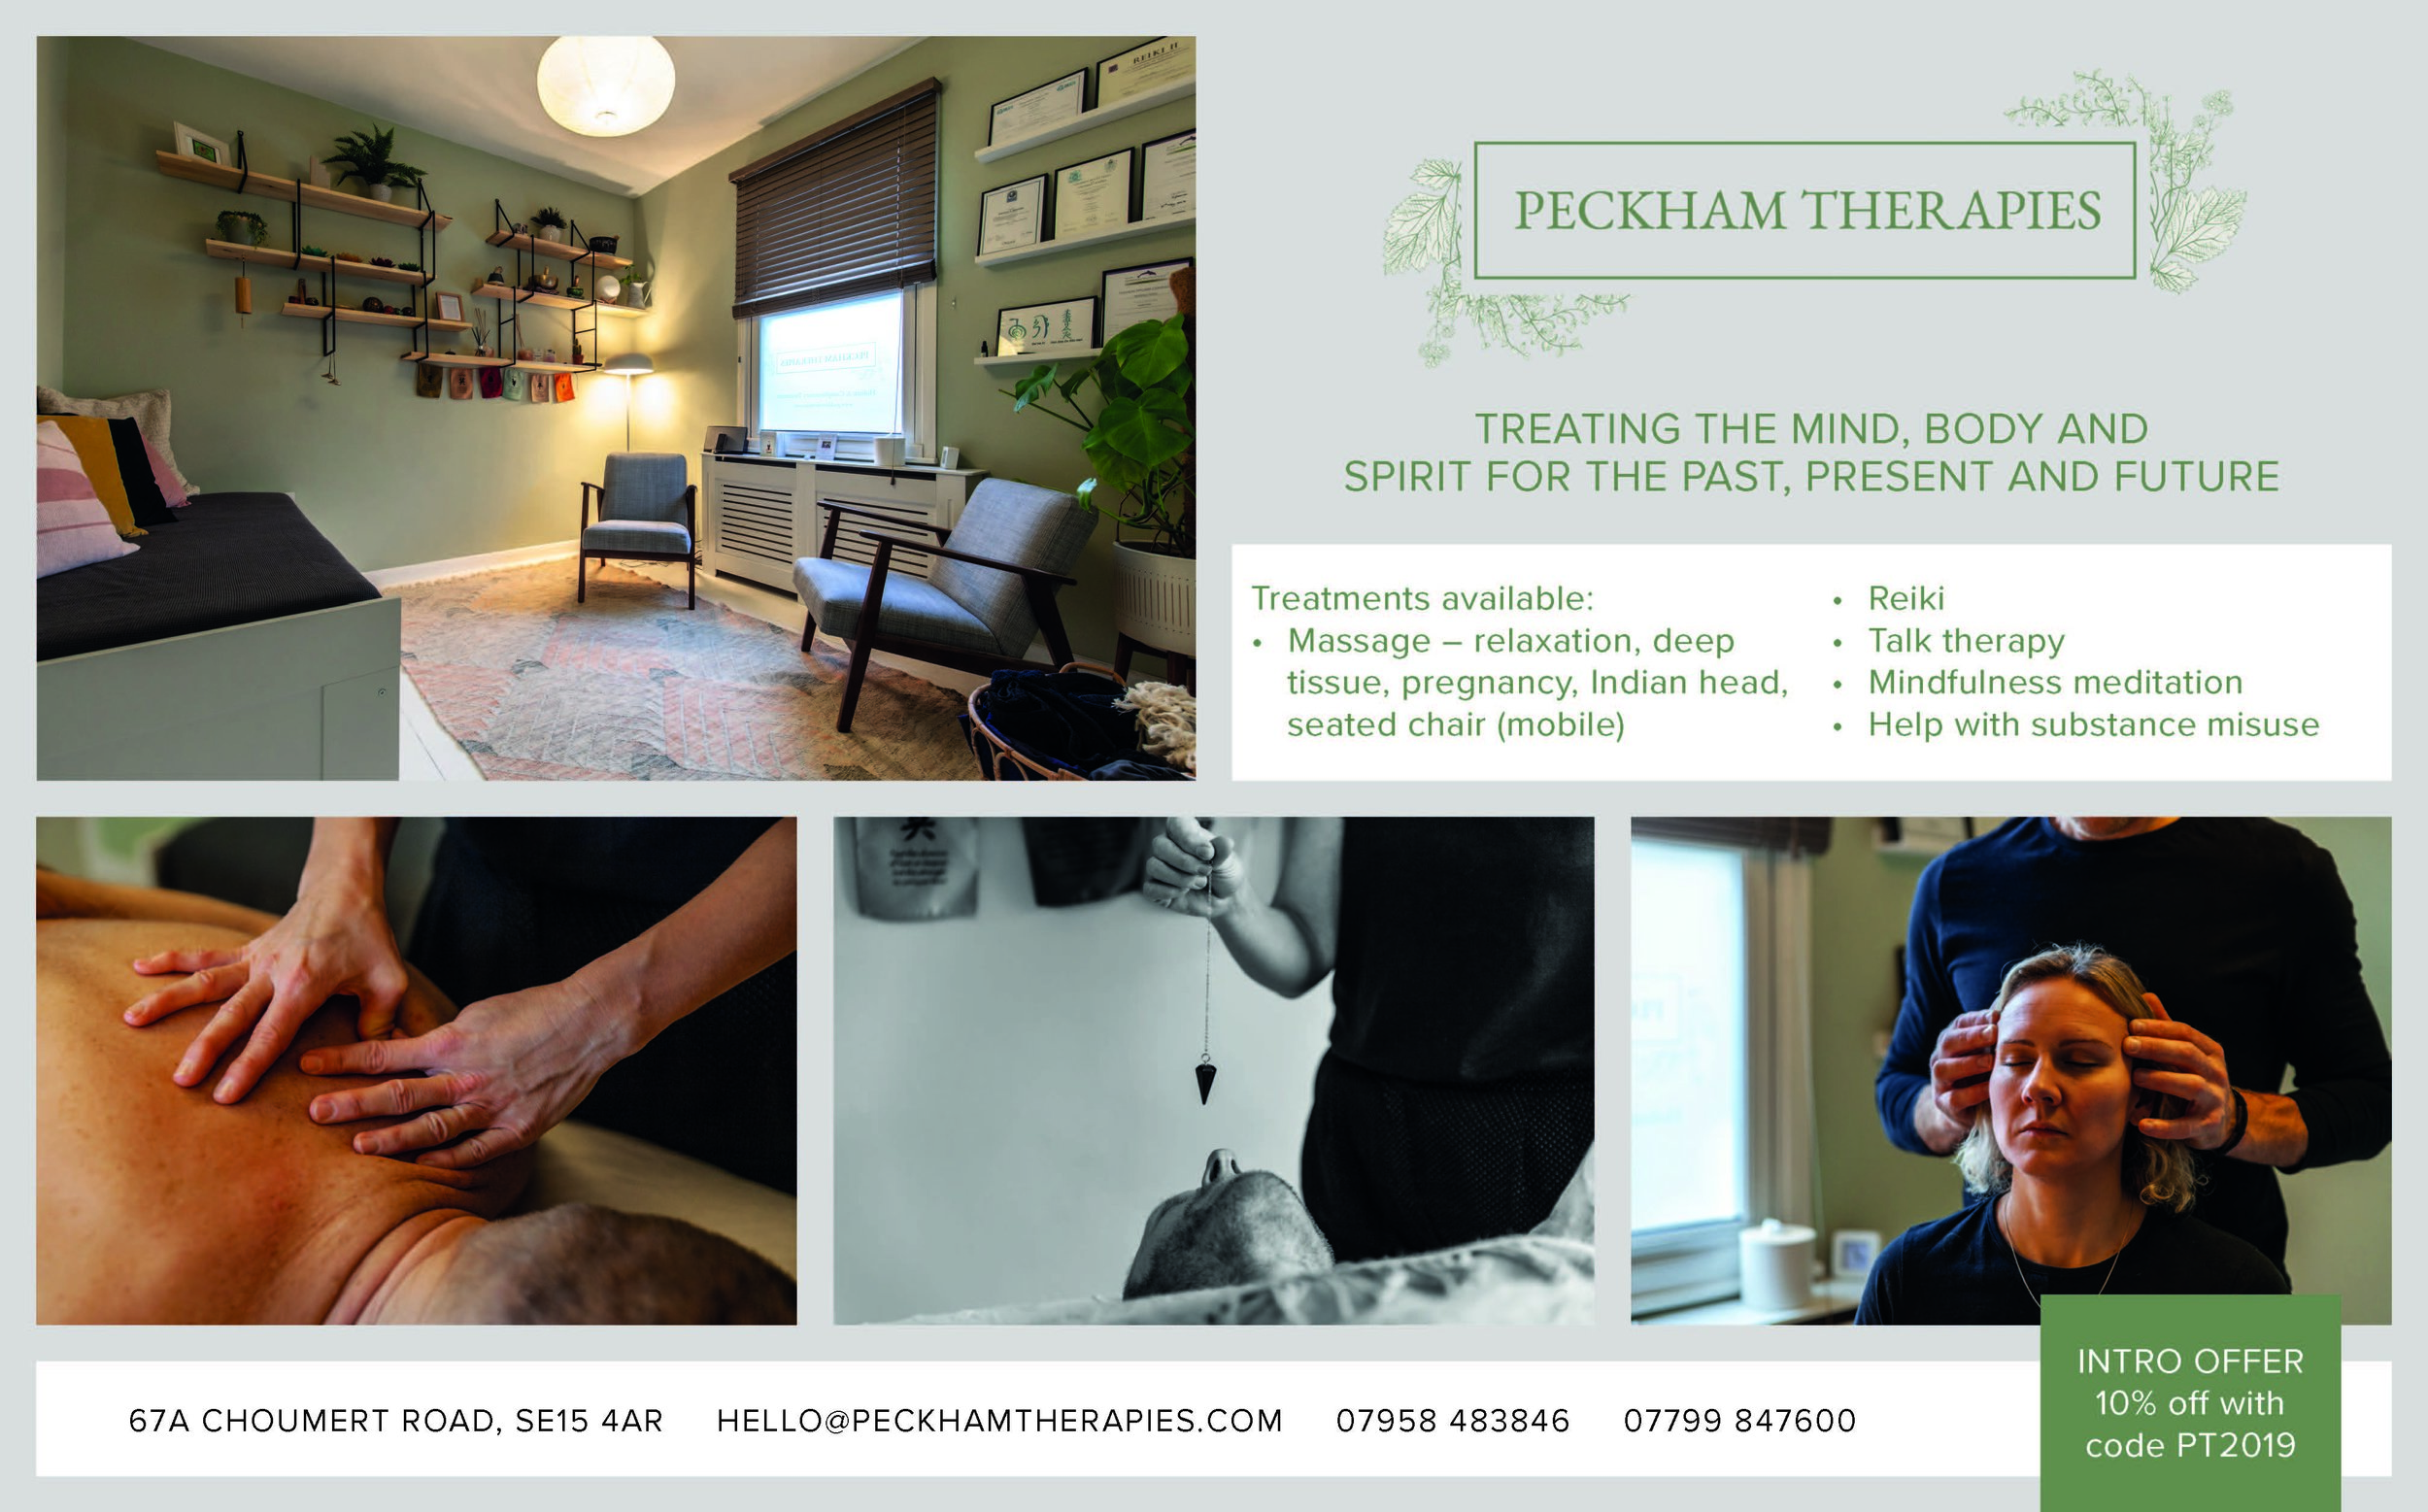 014 Peckham Therapies HP.jpg